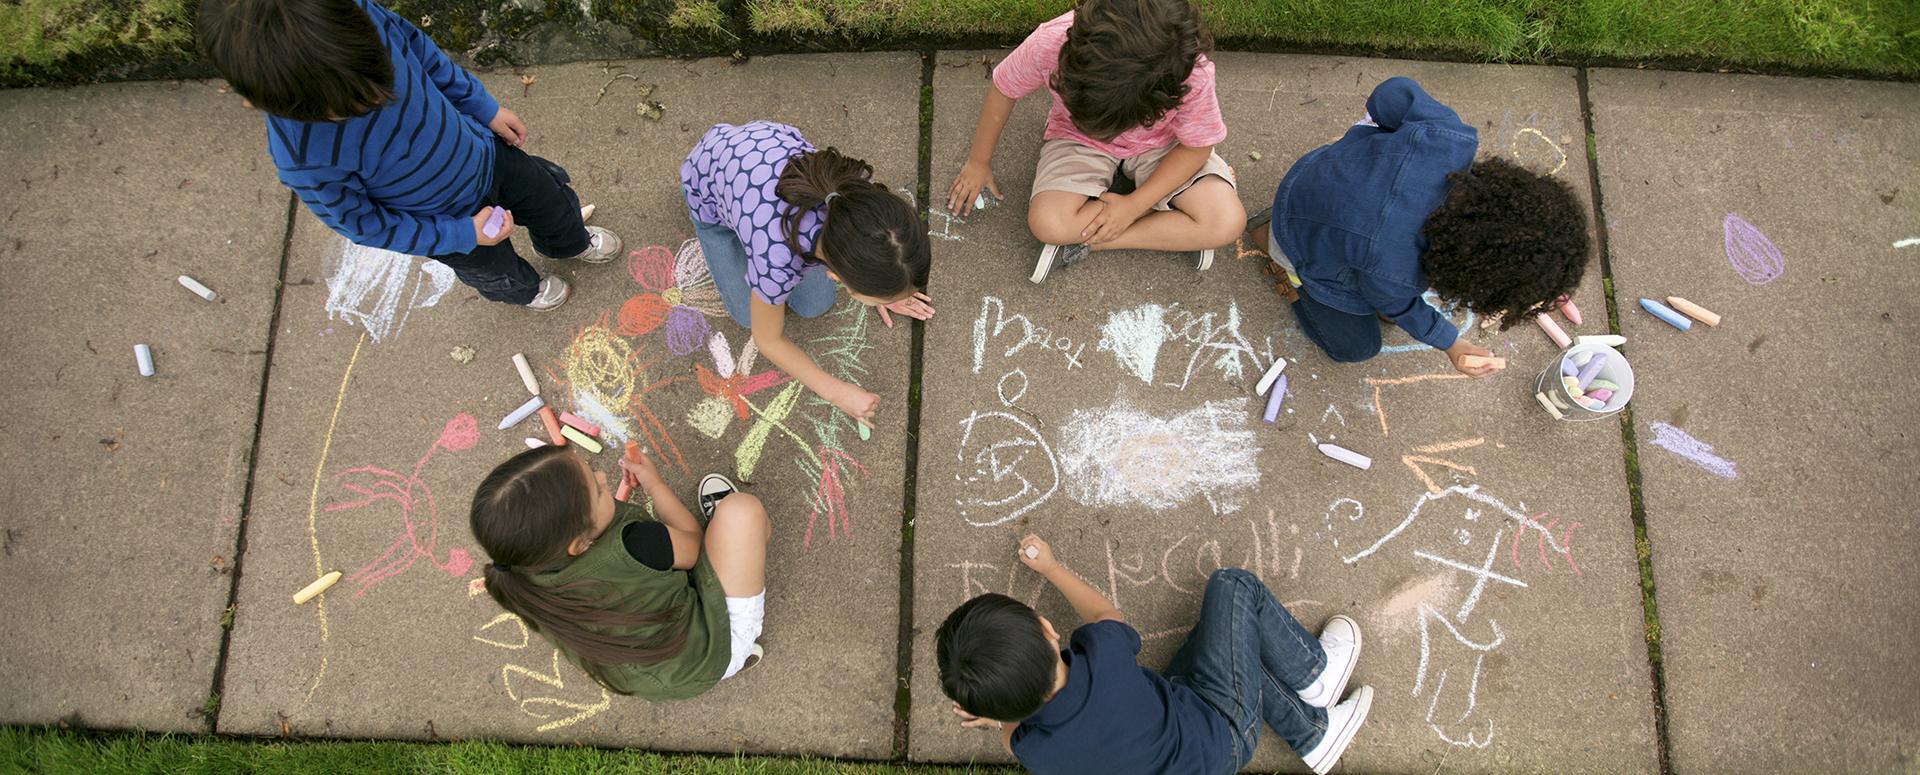 Kids play together on neighborhood sidewalk afterschool